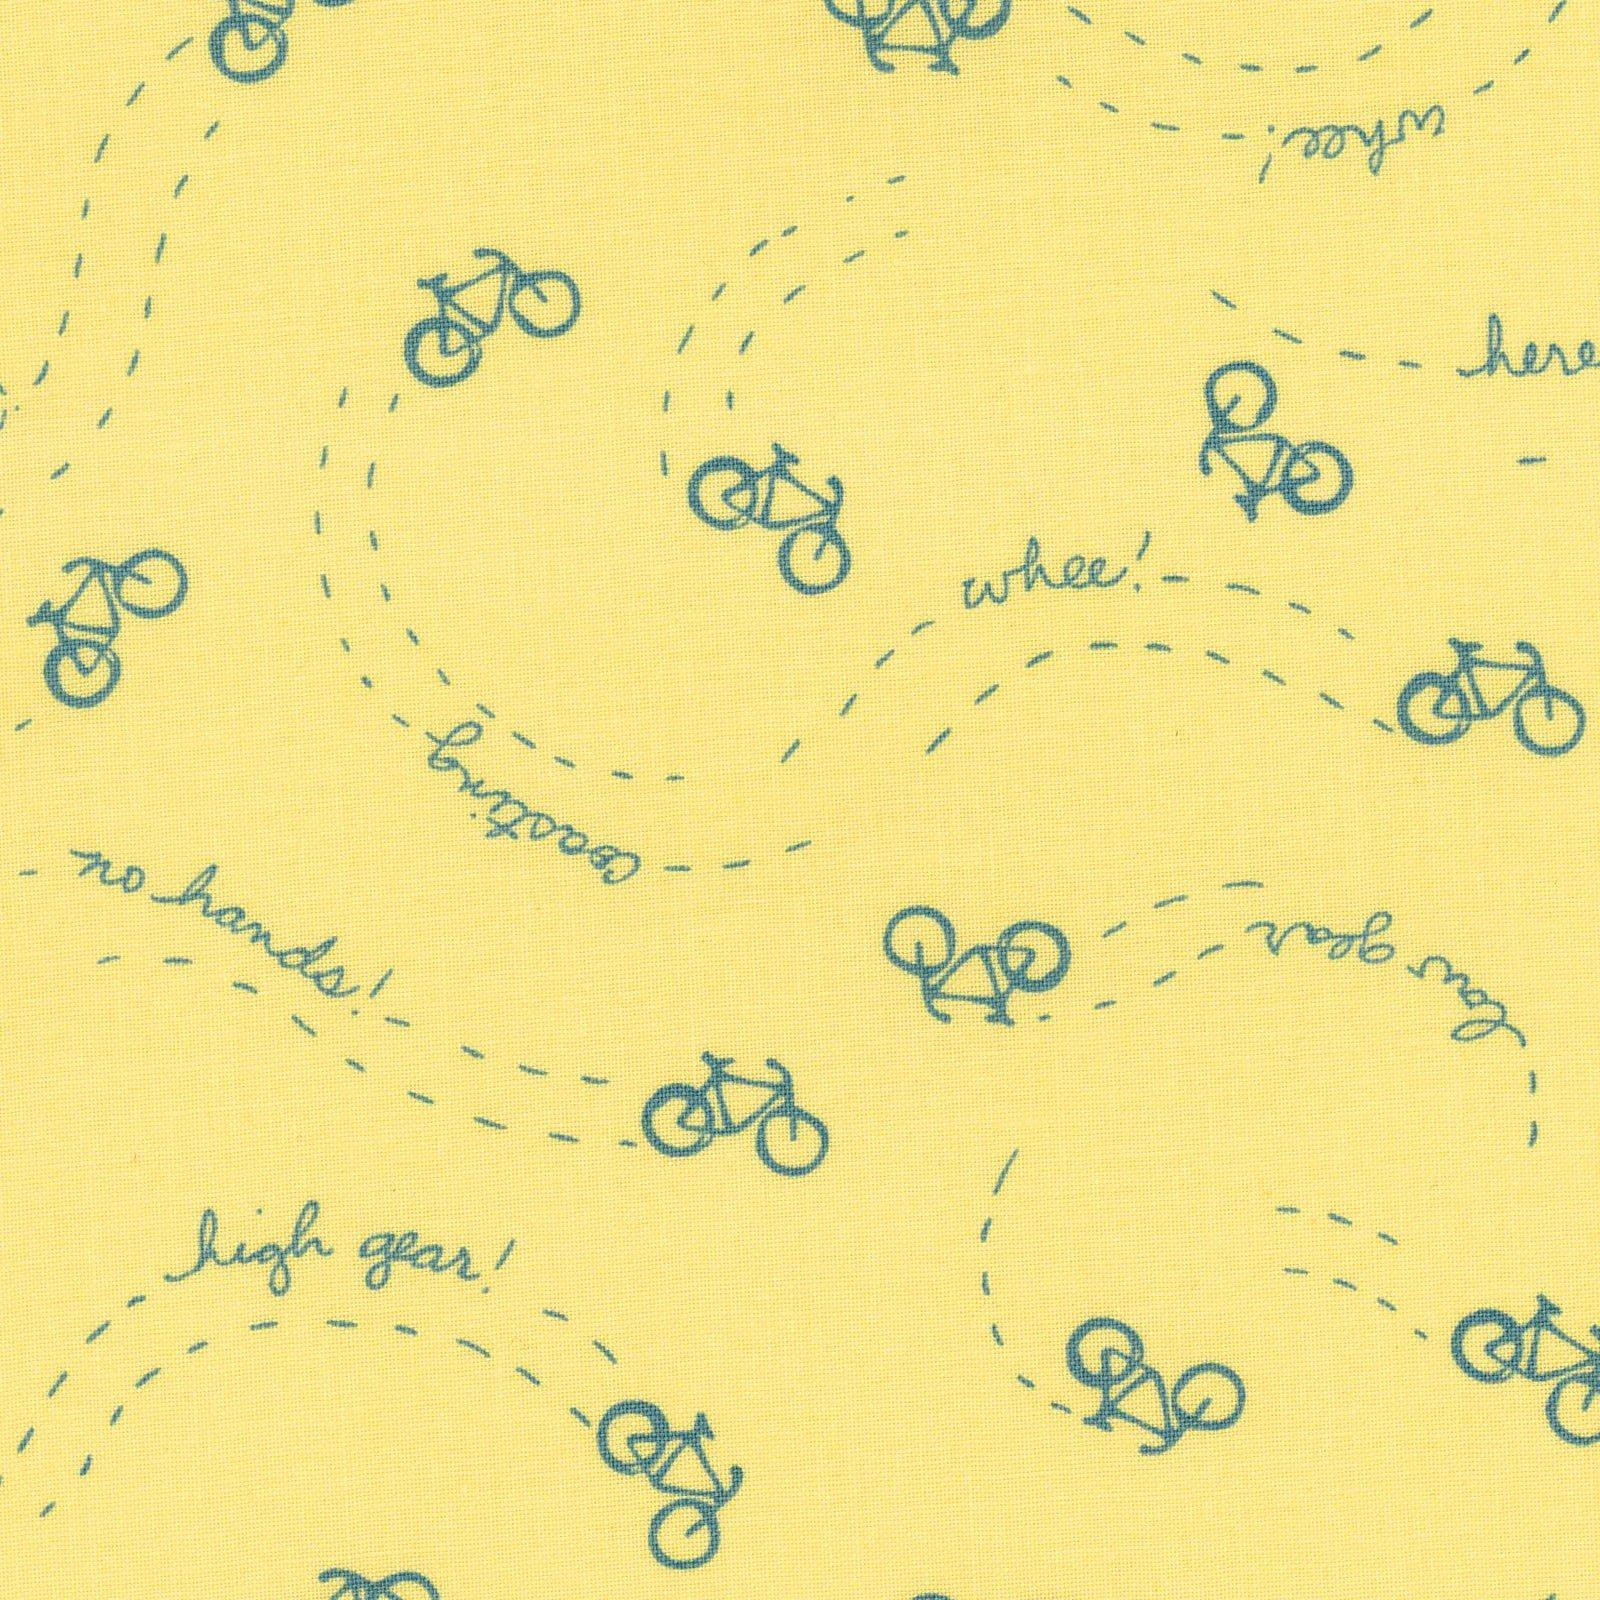 Cycles of Life Wheelie Yellow